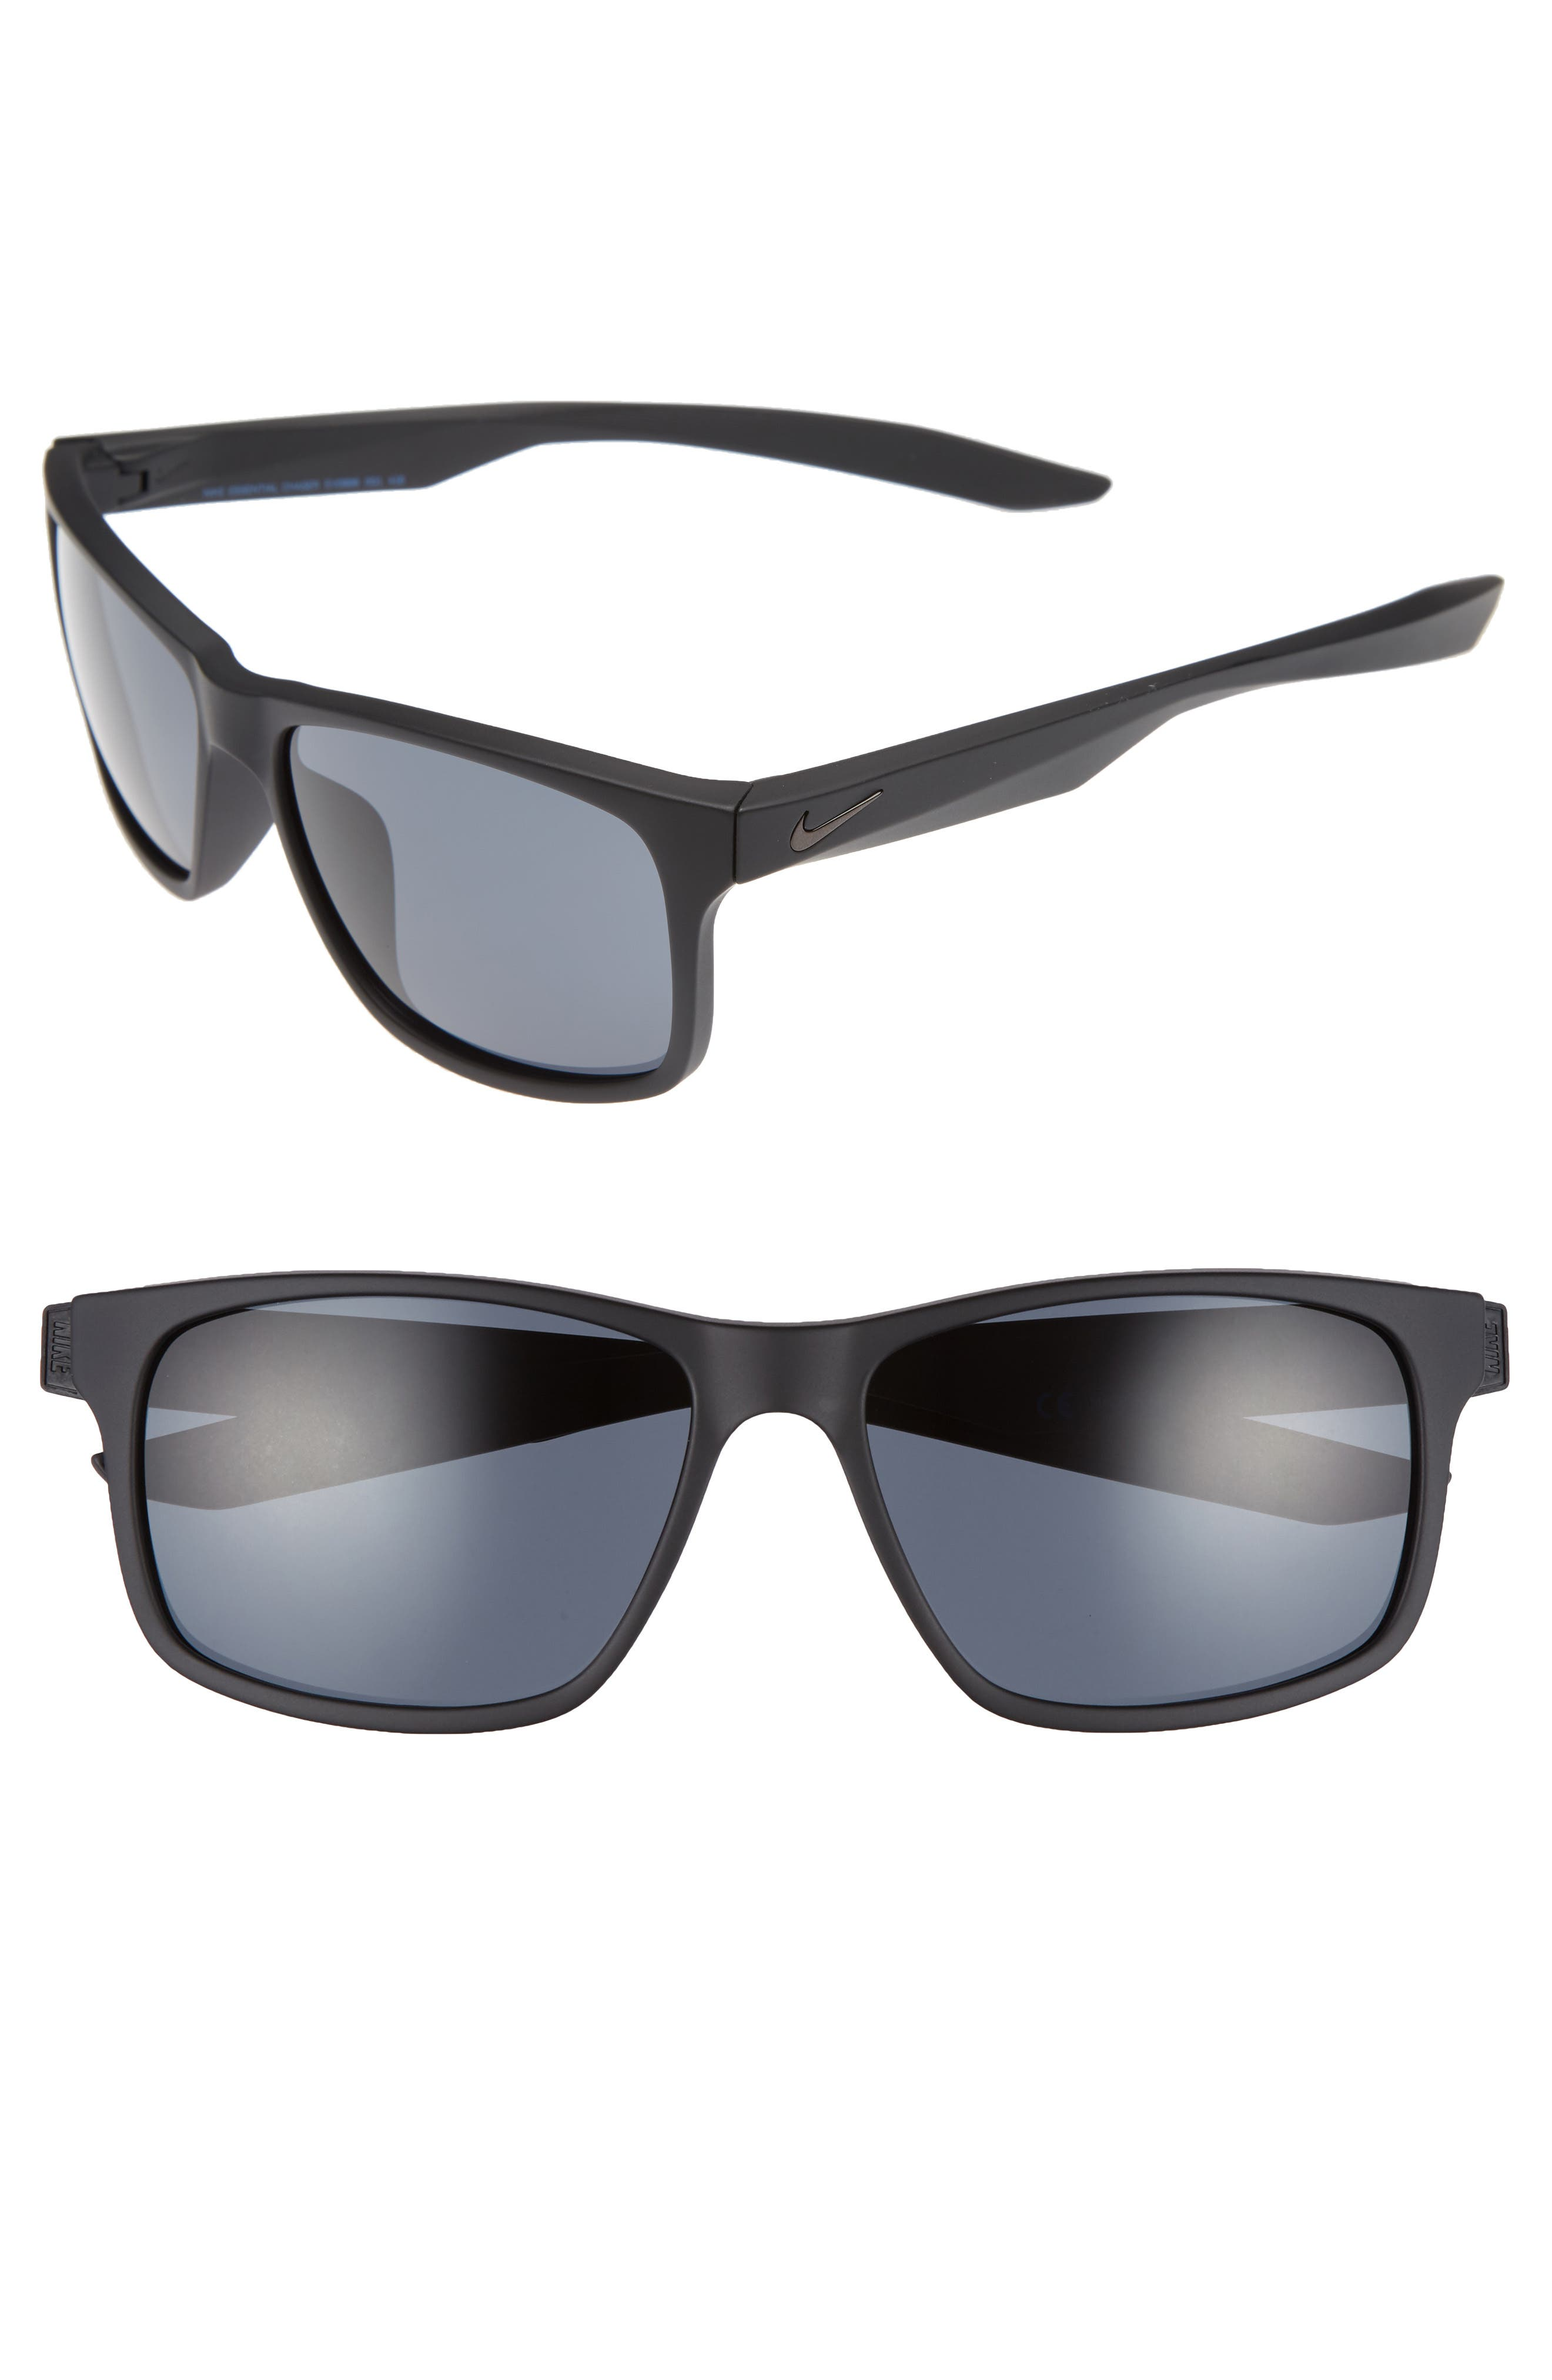 Essential Chaser 56mm Sunglasses,                             Main thumbnail 1, color,                             MATTE BLACK/ RACER BLUE